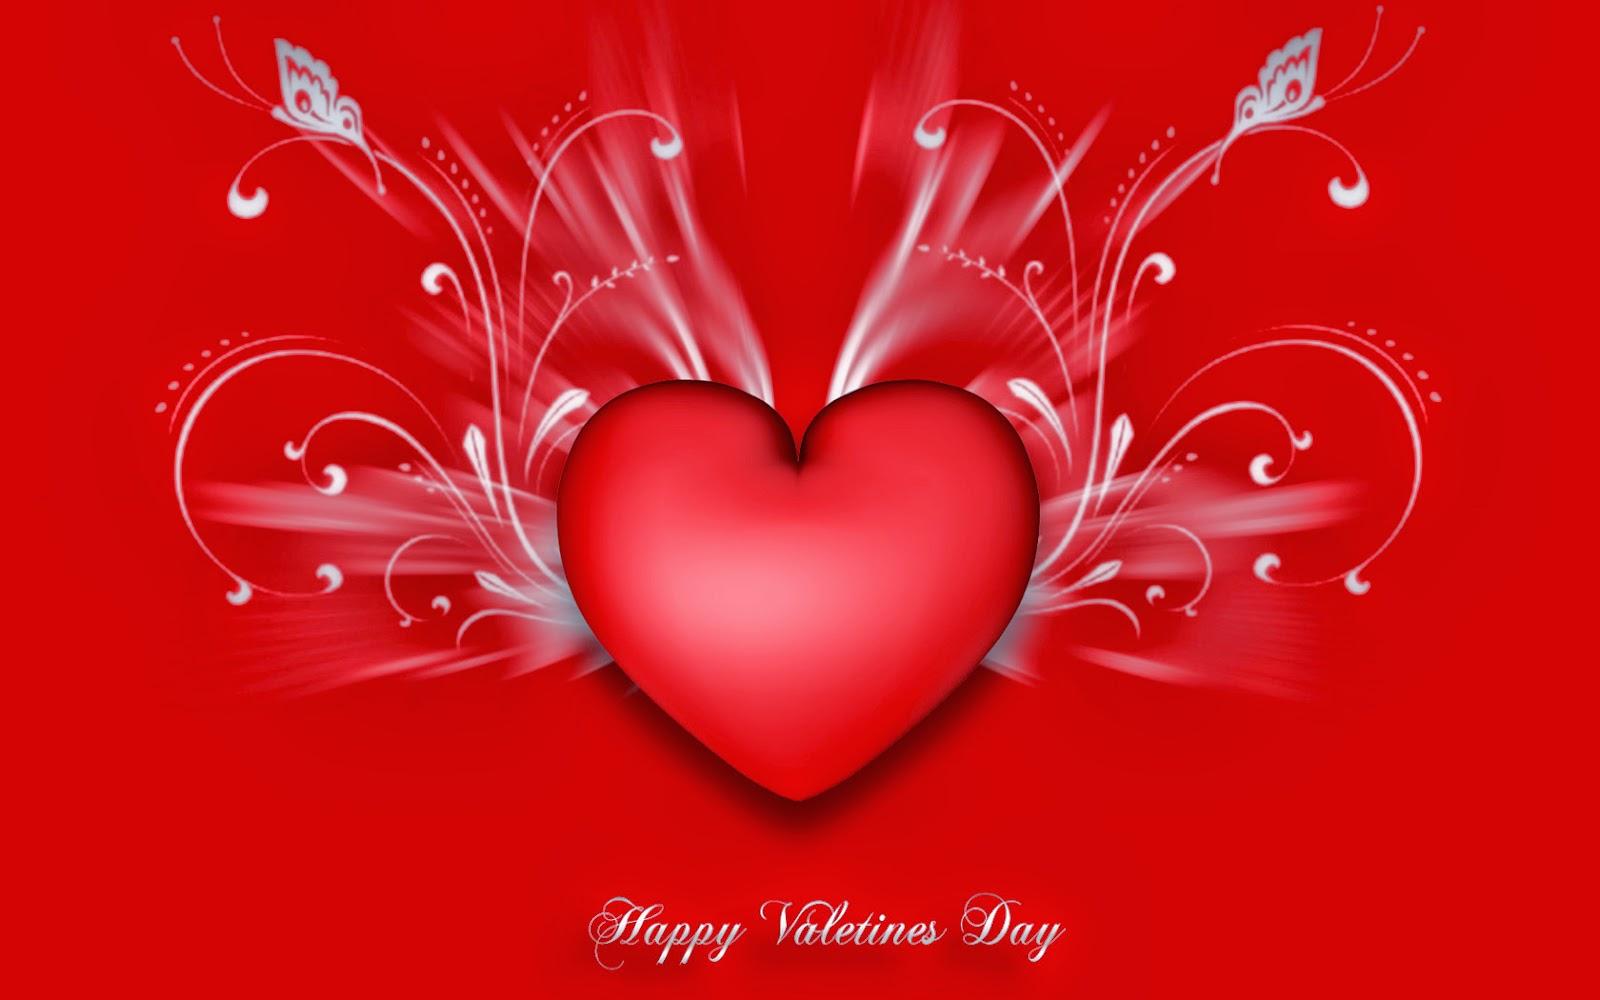 wallpaper desktop wallpaper valentines day 1600x1000